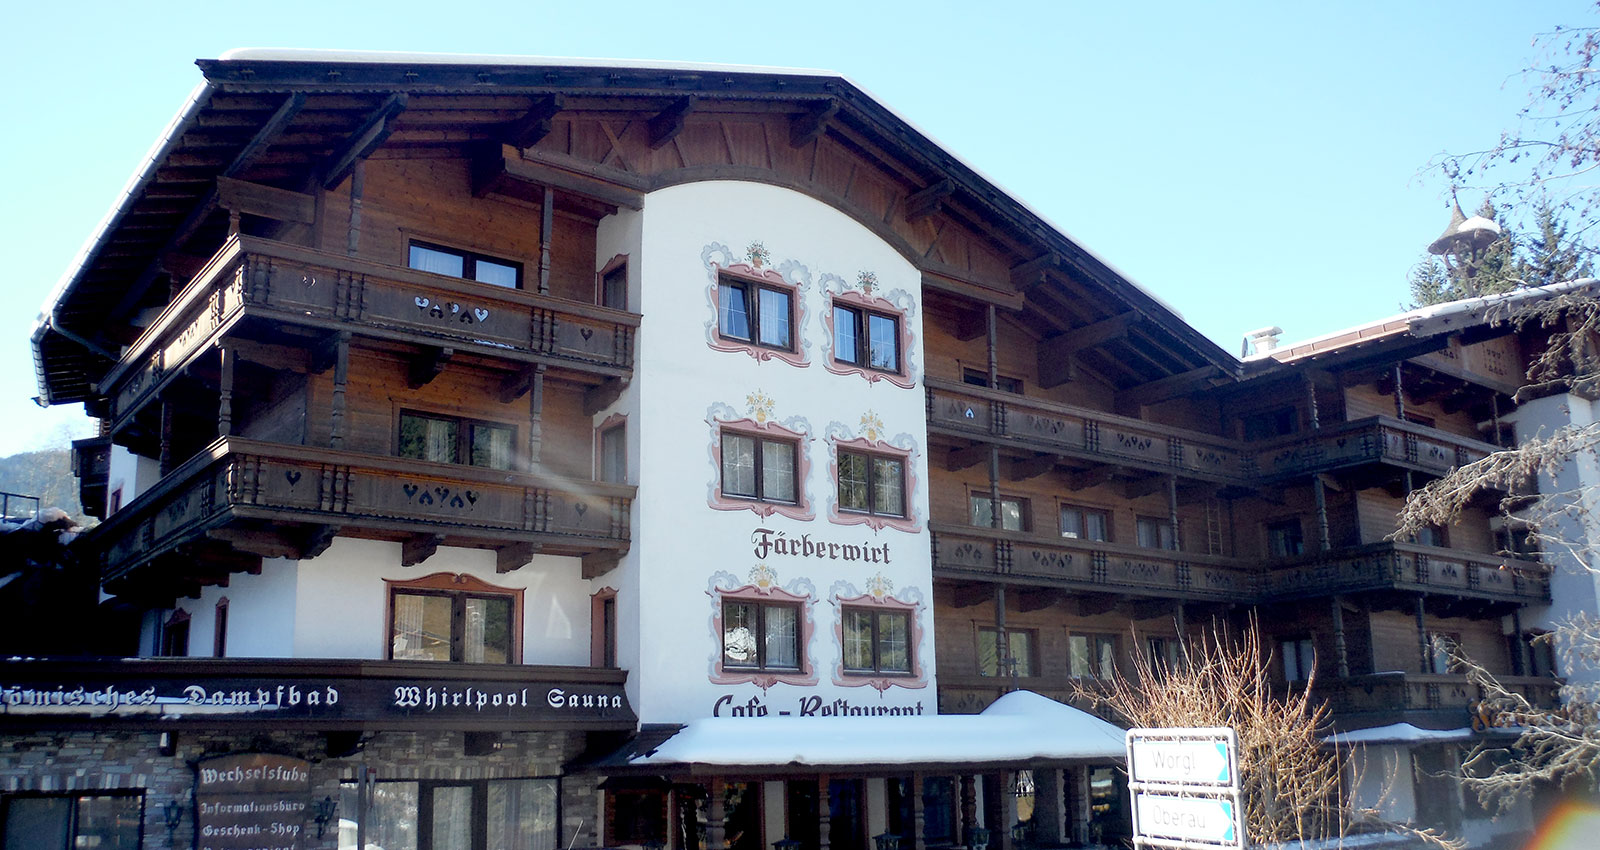 Casino Austria Parolijetons